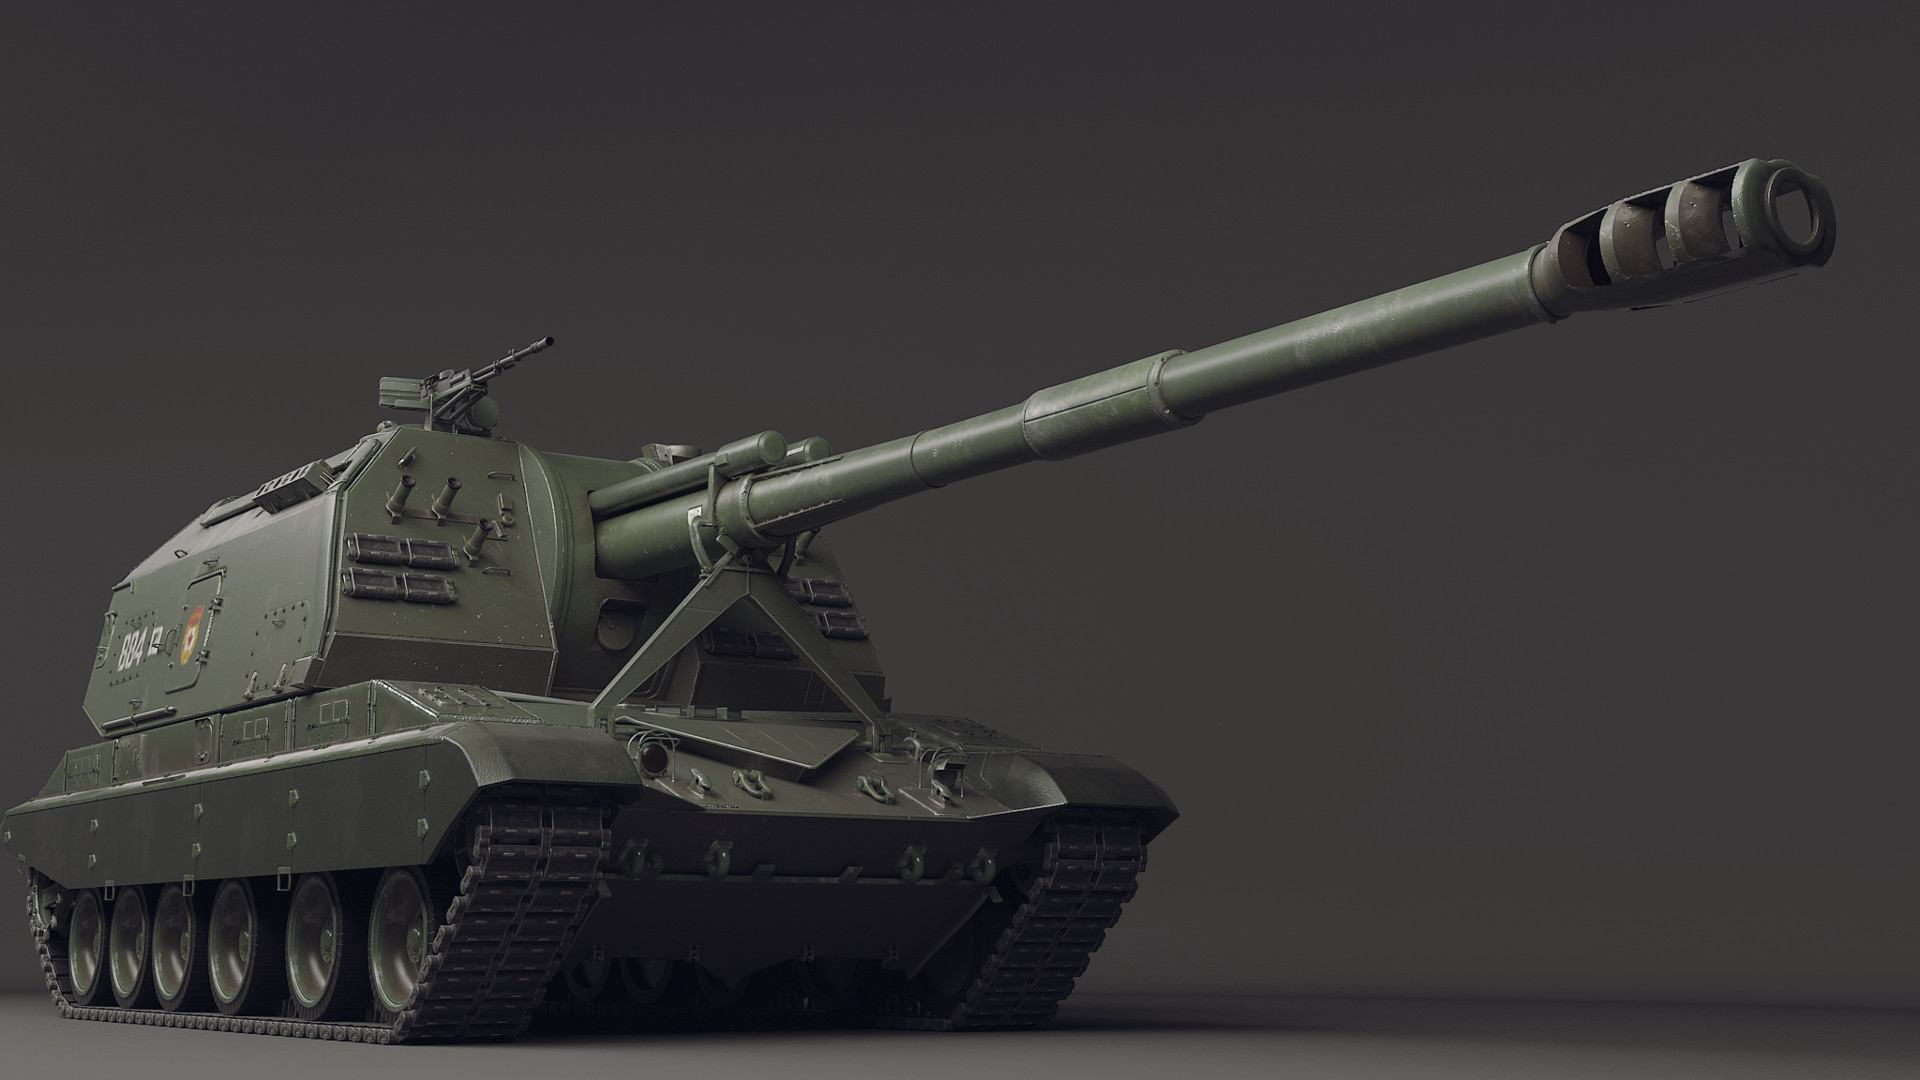 serge-andreyev-5343535c.jpg?1524660409